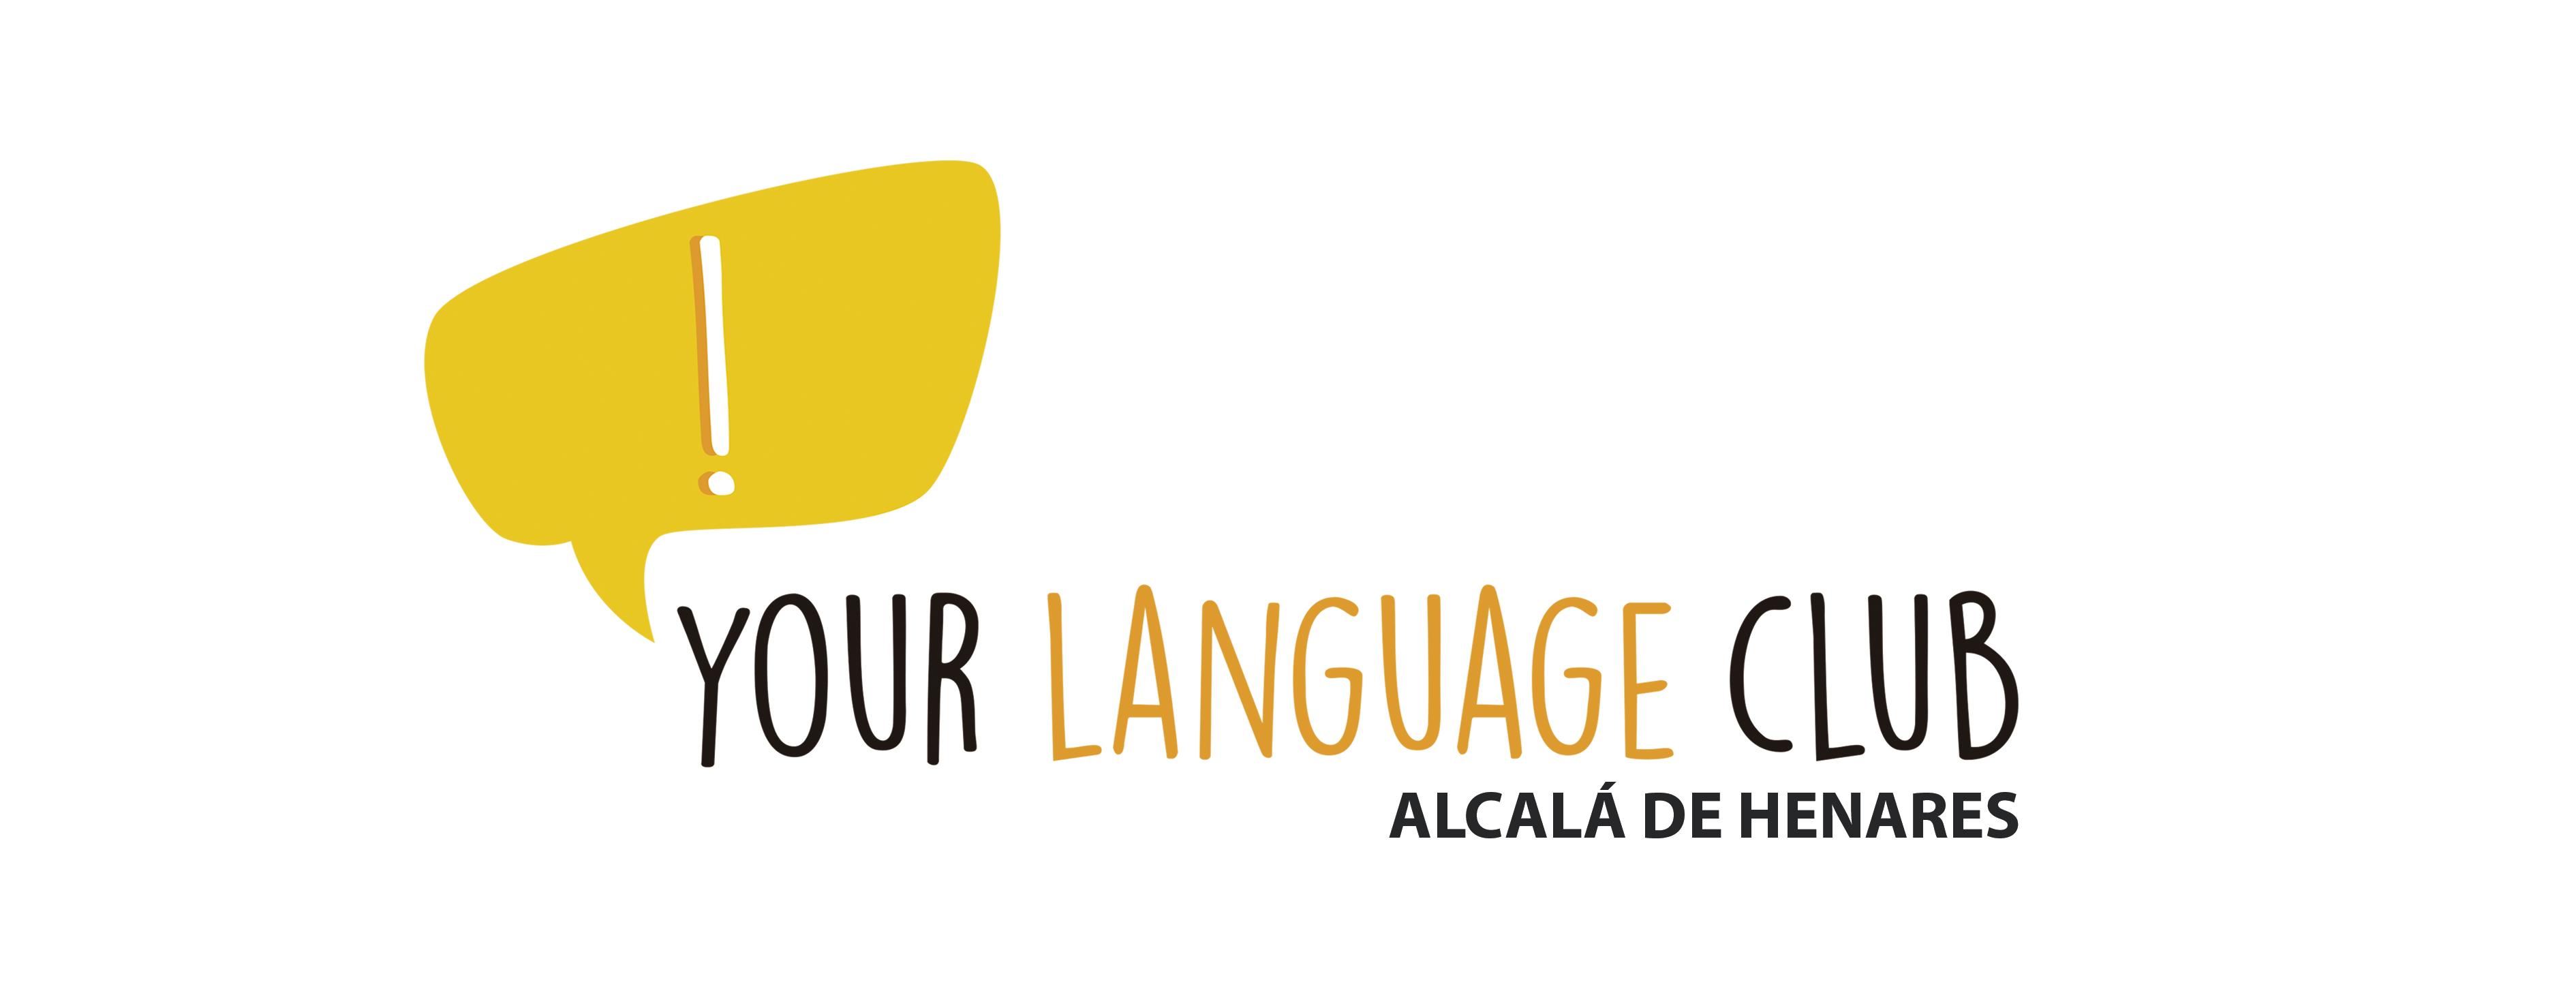 Your Language Club Alcala De Henares